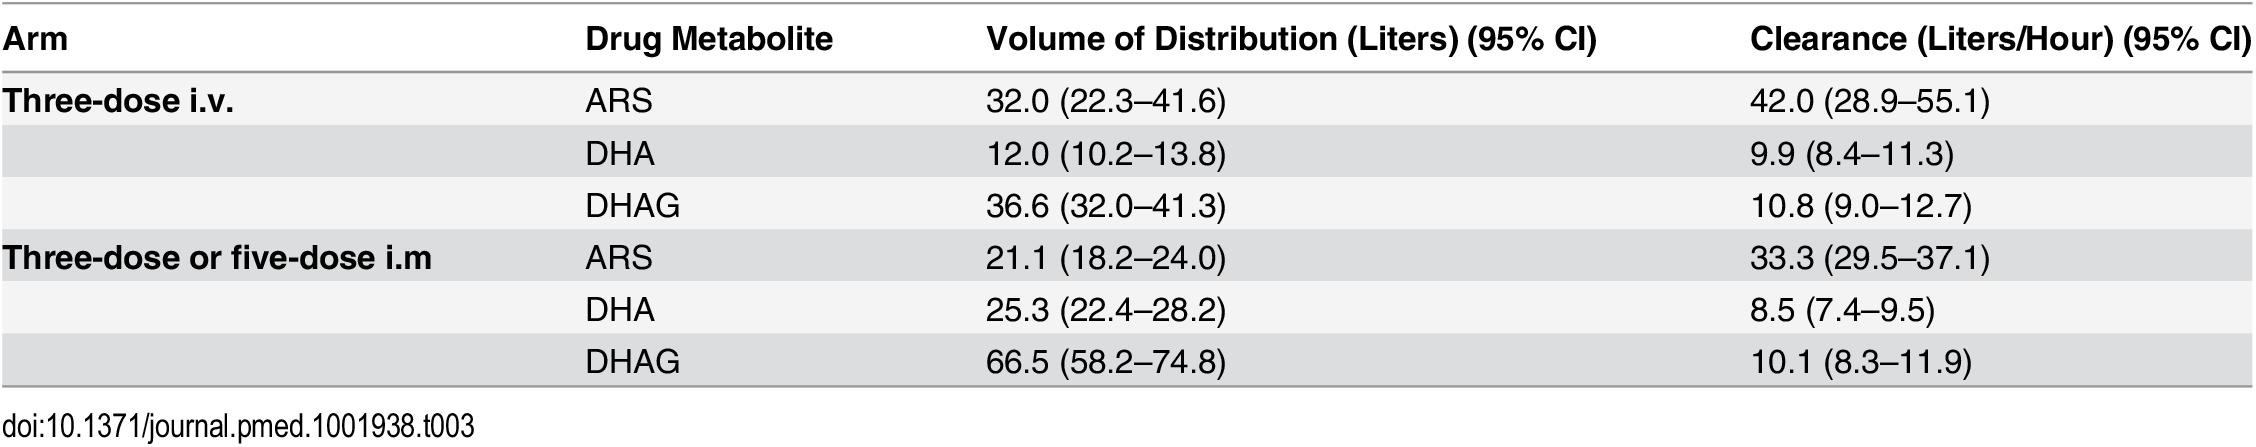 Population pharmacokinetic analysis of parenteral artesunate in severe malaria.